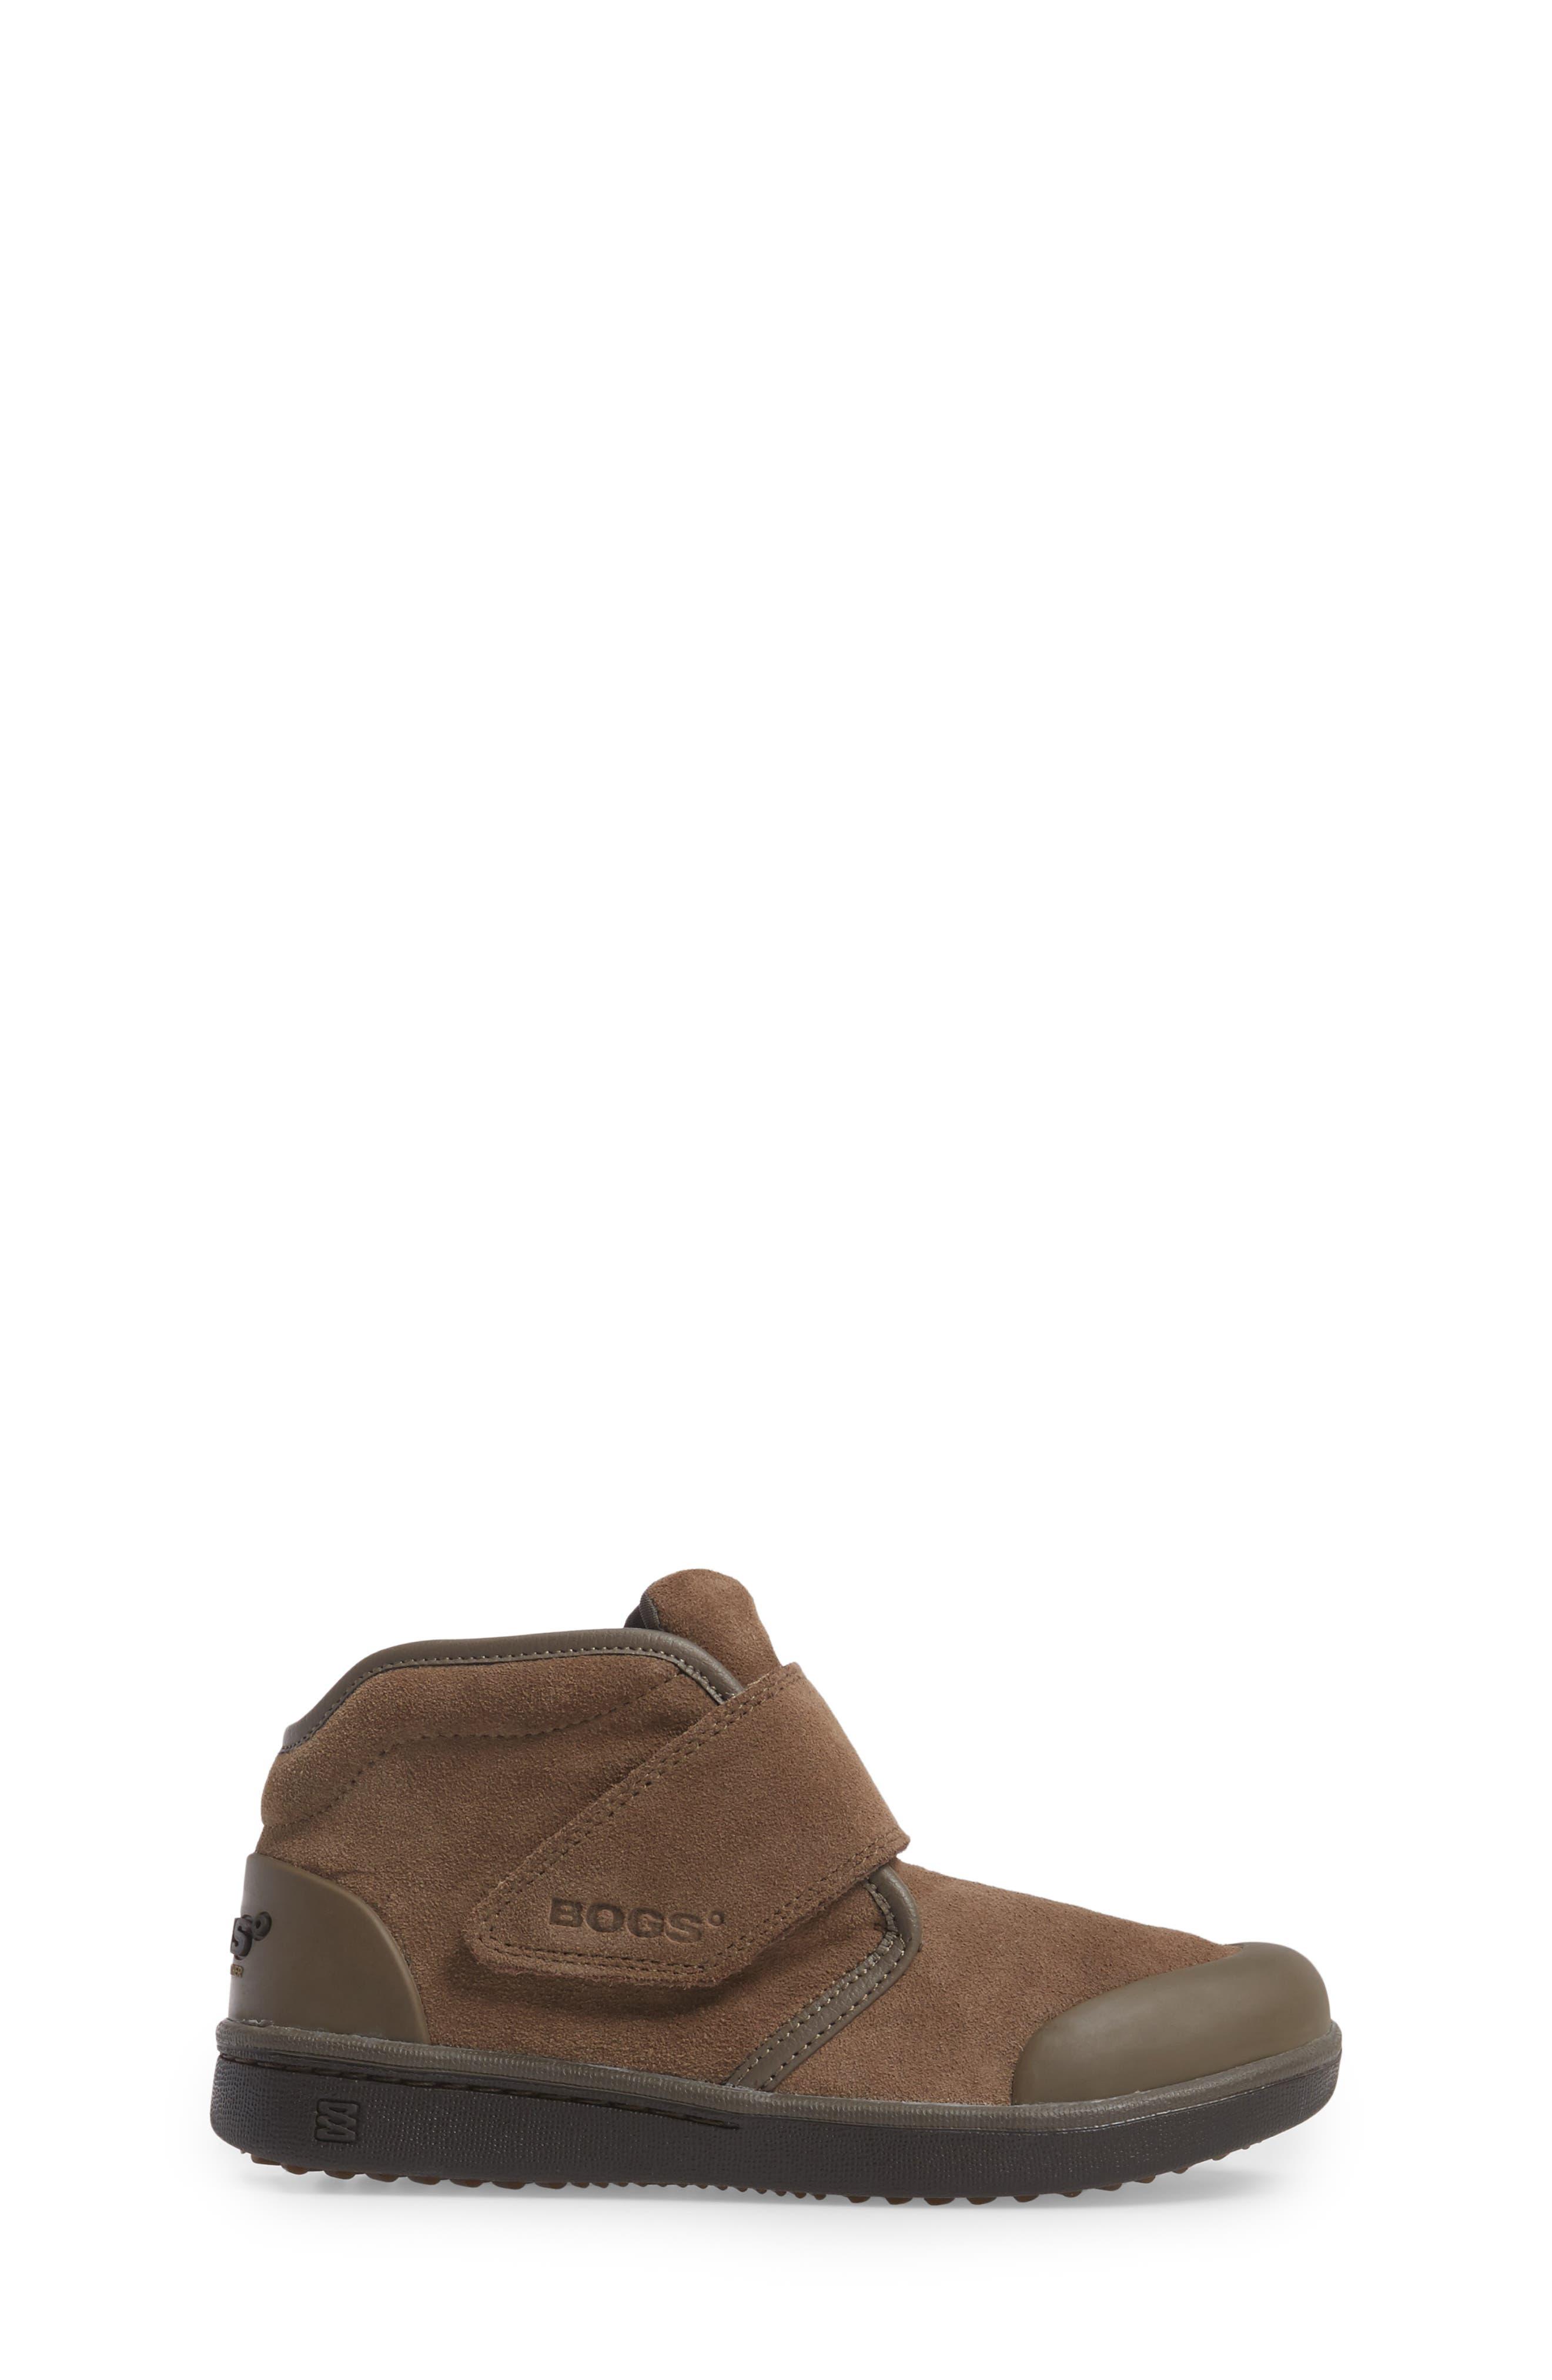 'Sammy' Waterproof Sneaker,                             Alternate thumbnail 3, color,                             TAN